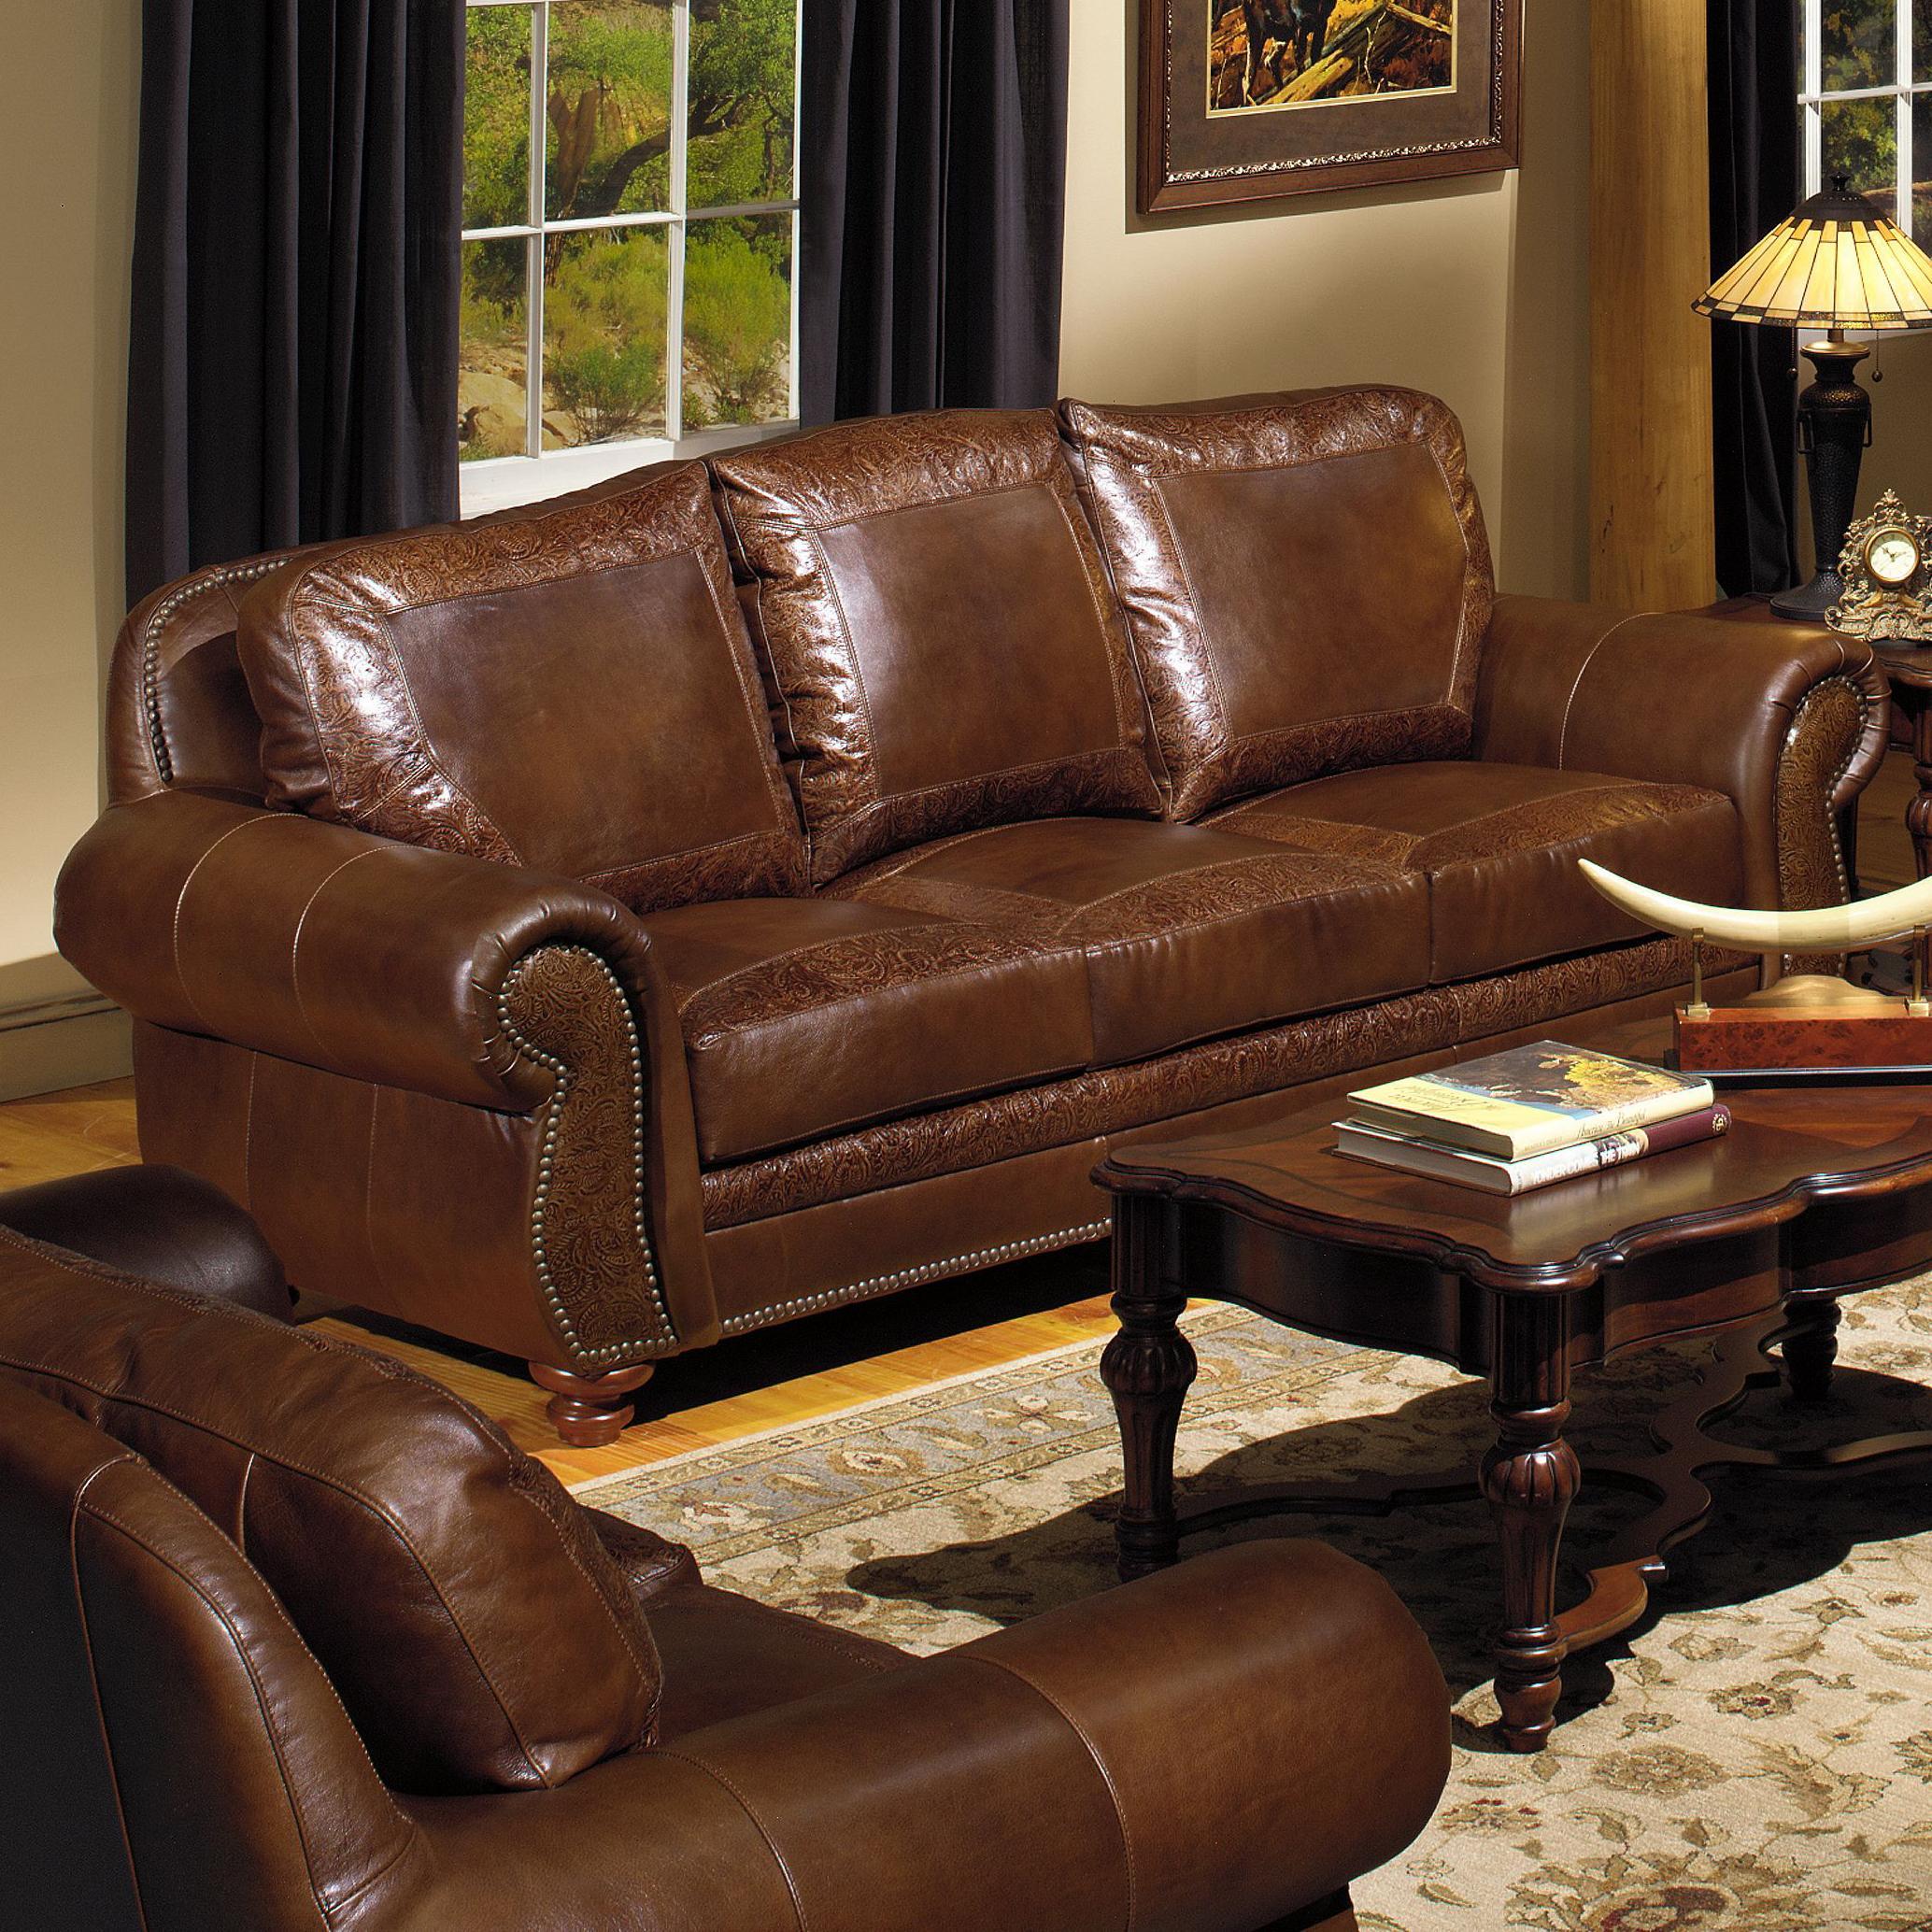 USA Premium Leather 8555 Traditional Leather Sofa With Nailhead Trim Olindes Furniture Sofas